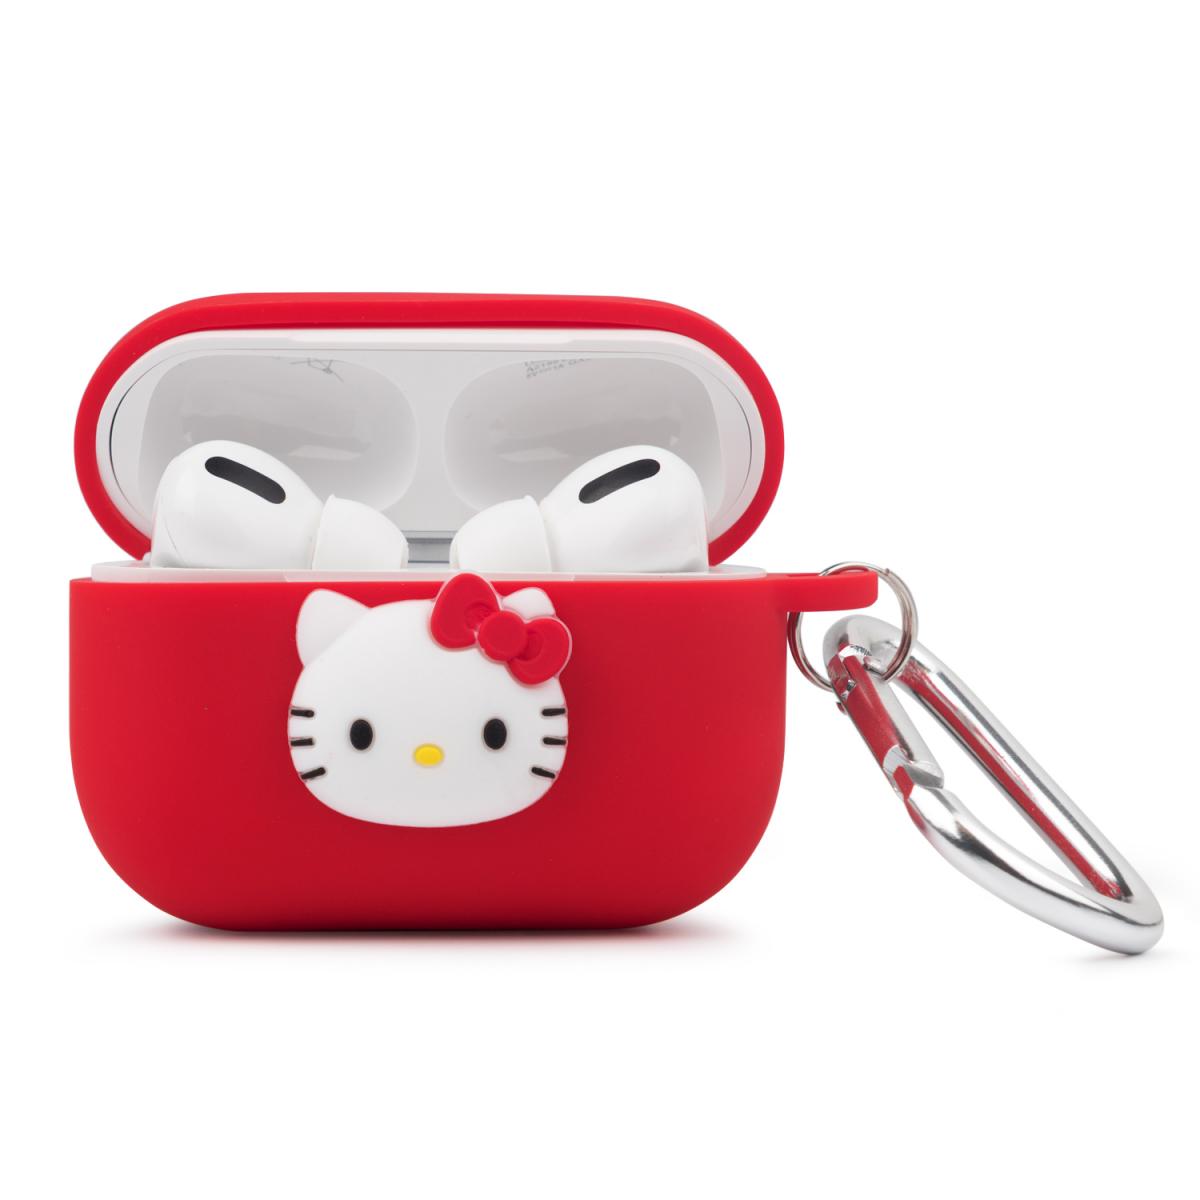 Чехол для Apple Airpods Hello Kitty Cartoon Silicone Case Red фото